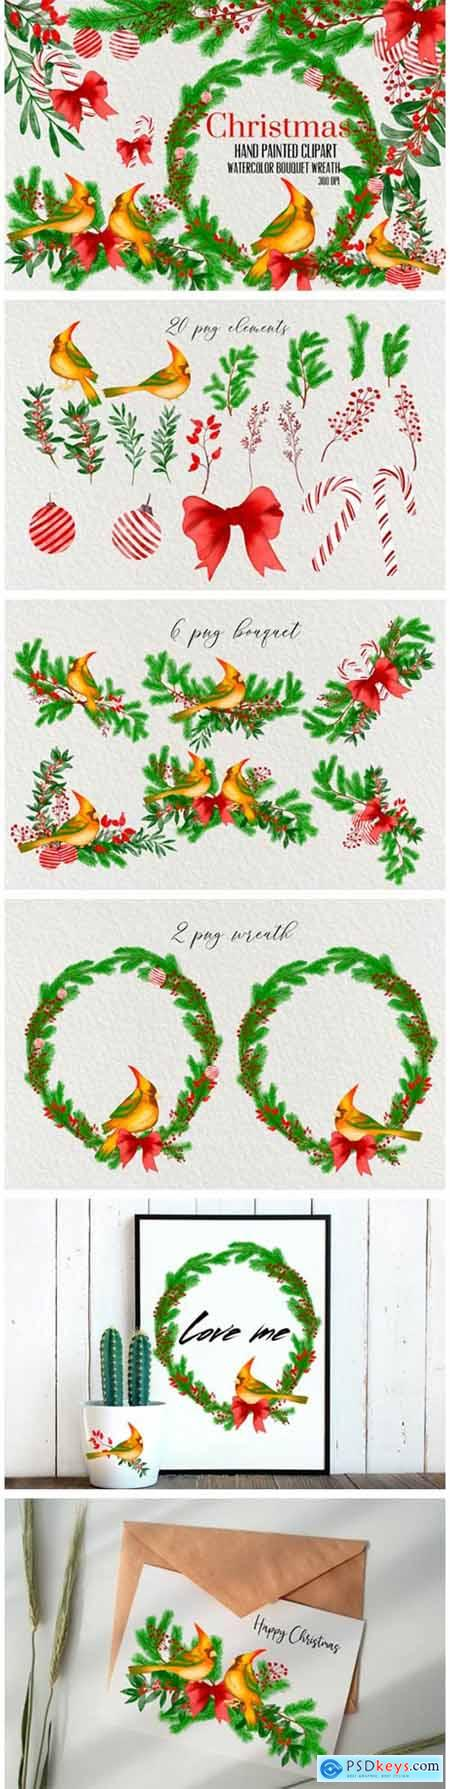 Watercolor Christmas Flower Clip Art 4674412